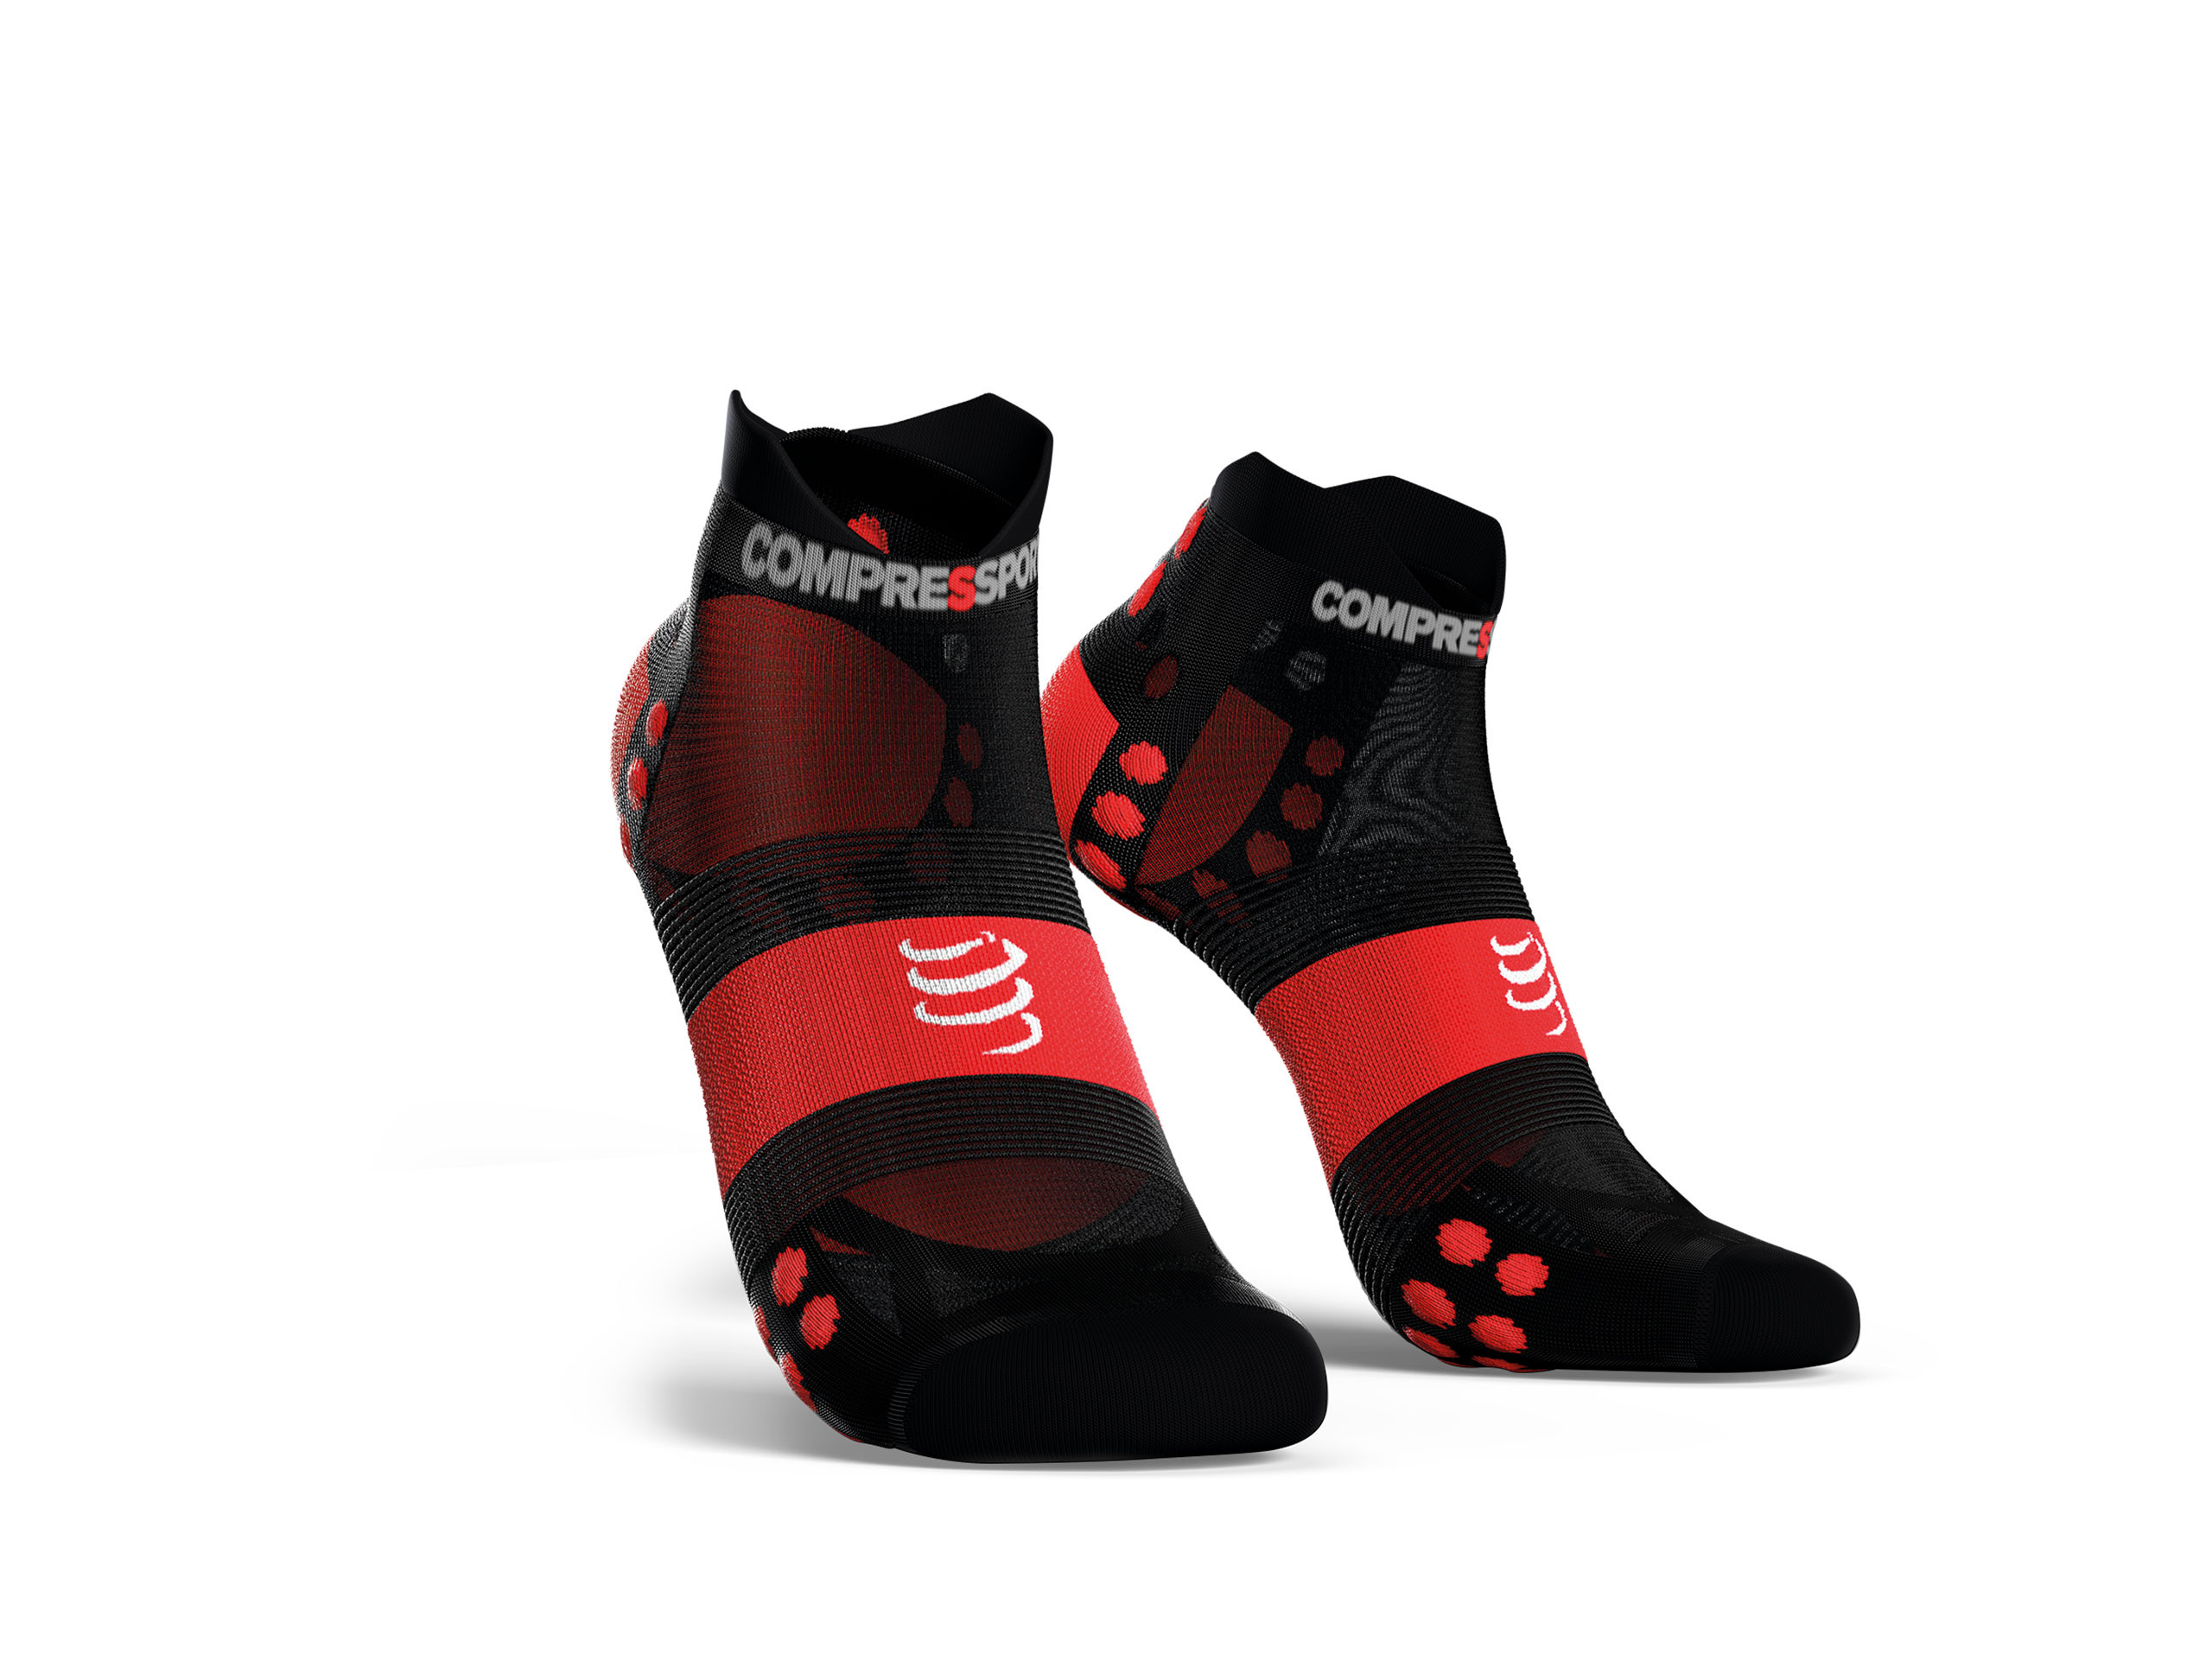 Pro Racing Socks v3.0 Run Ultralight Run Low black/red